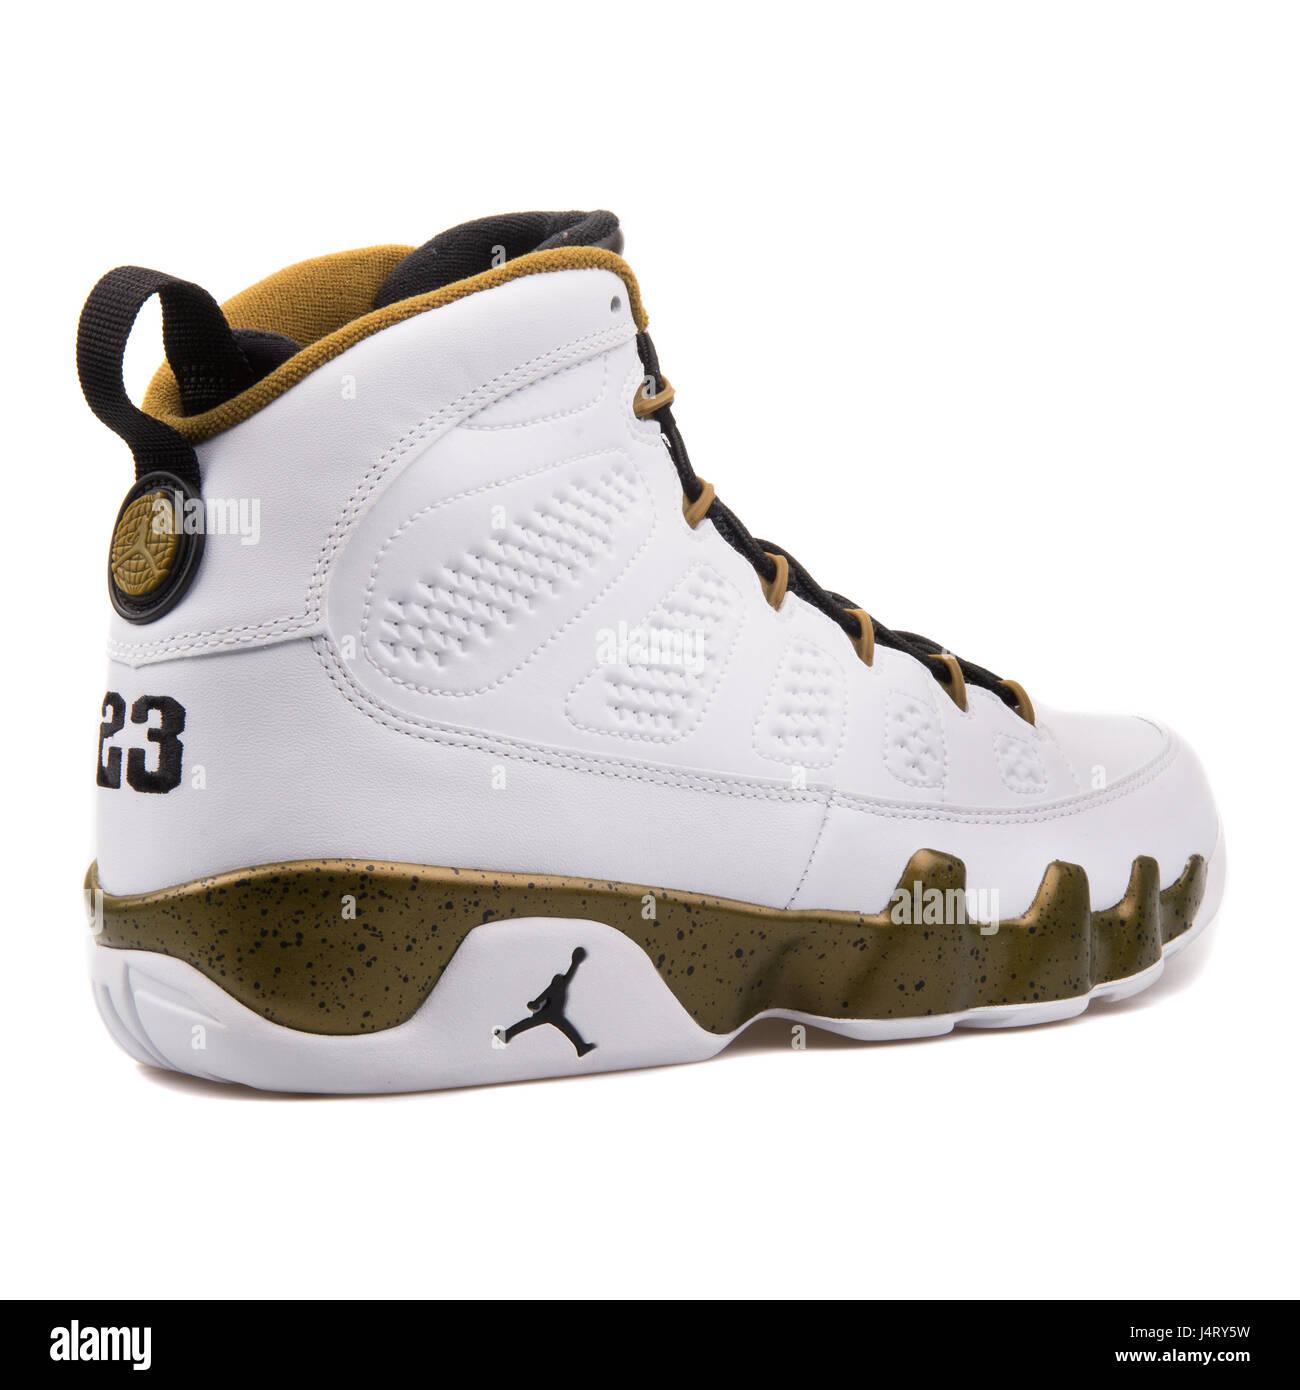 e71e3b84a91 Nike Air Jordan 9 Retro White Black Militia Green High Leather Sneakers -  302370-109